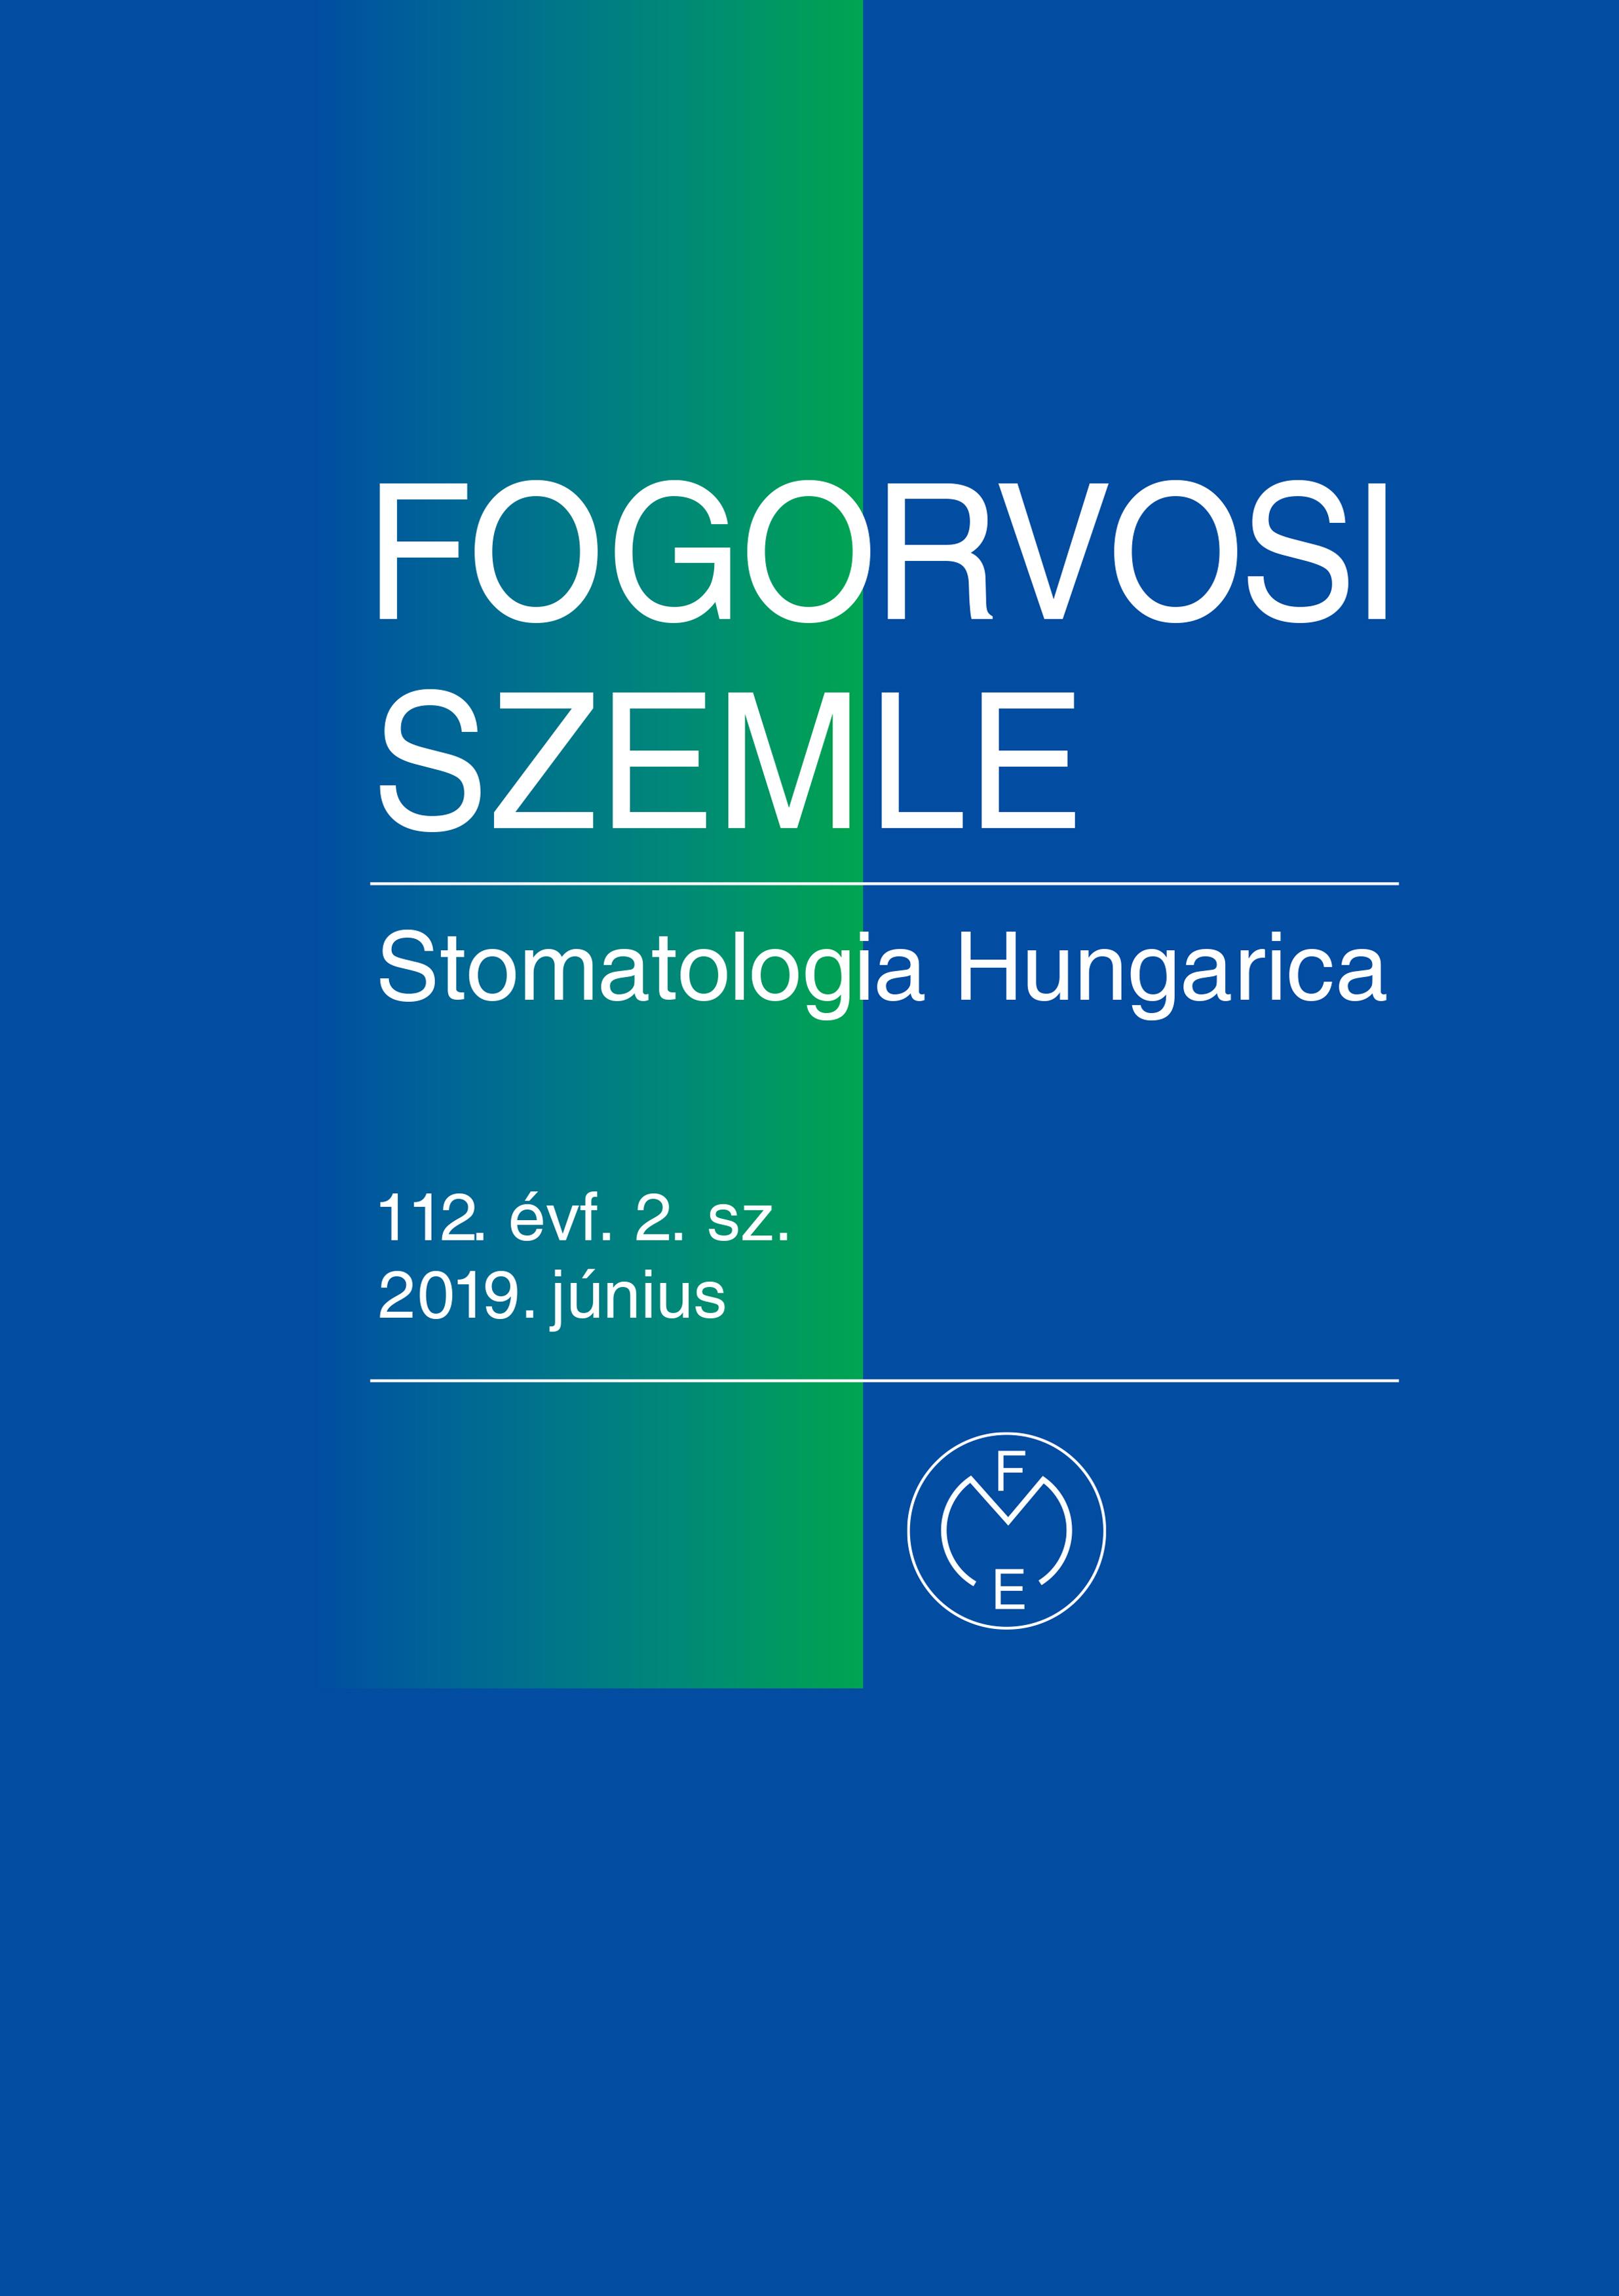 Fogorvosi Szemle 2019. június